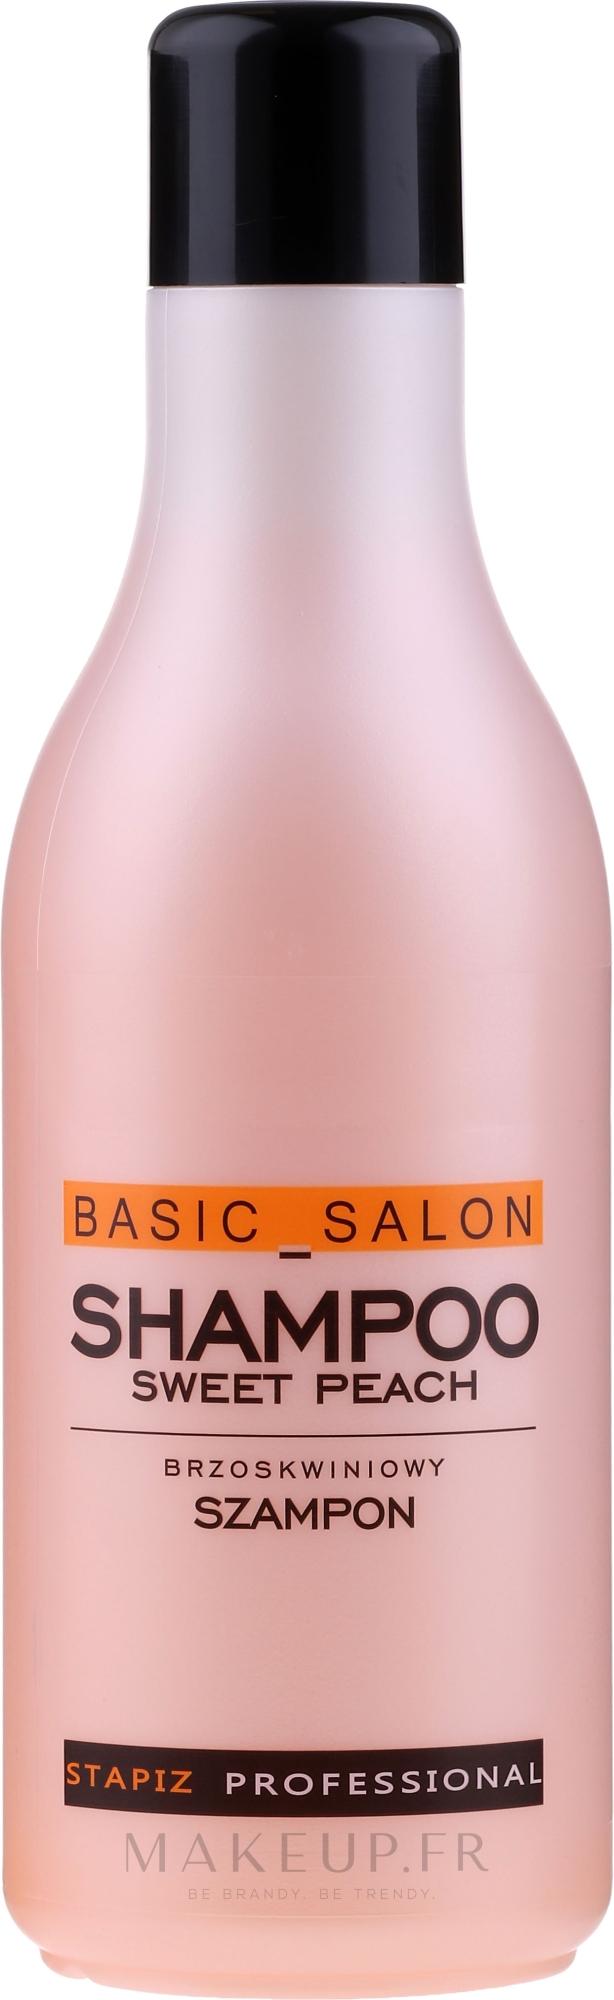 Shampooing à l'arôme de pêche - Stapiz Basic Salon Shampoo Sweet Peach — Photo 1000 ml